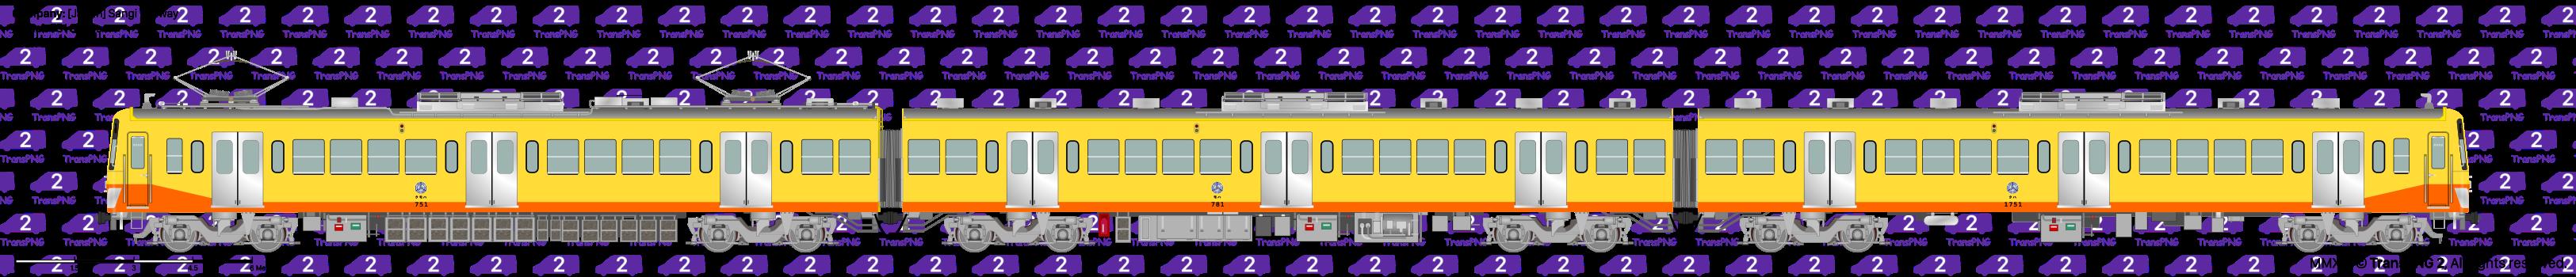 Train 24023